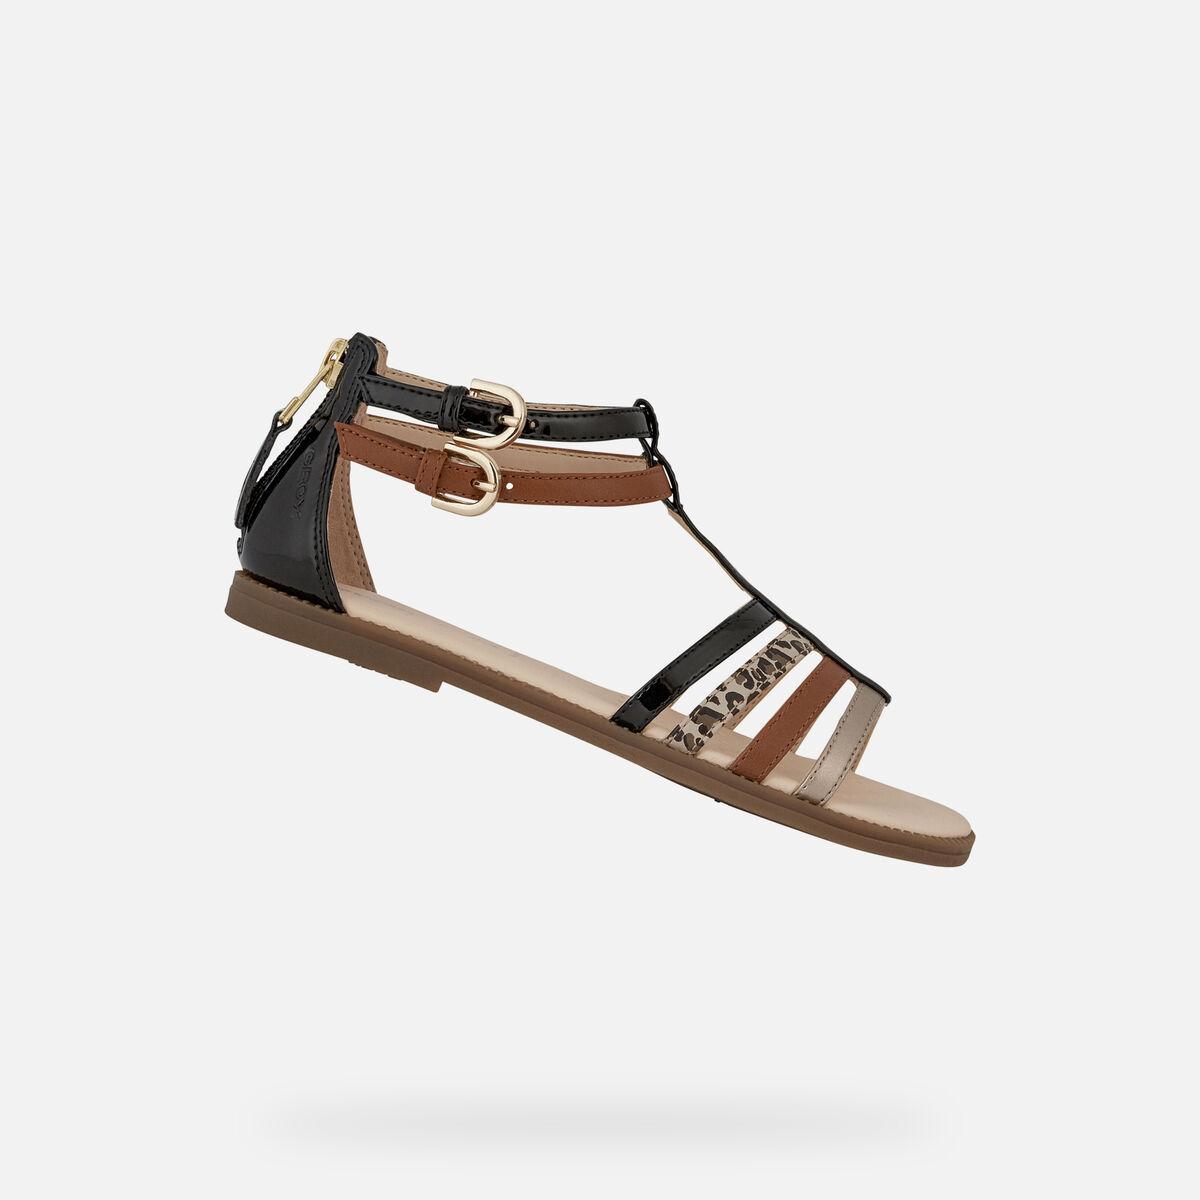 Sandale en cuir pour fille Geox Karly J7235D C9b5g black/caramel